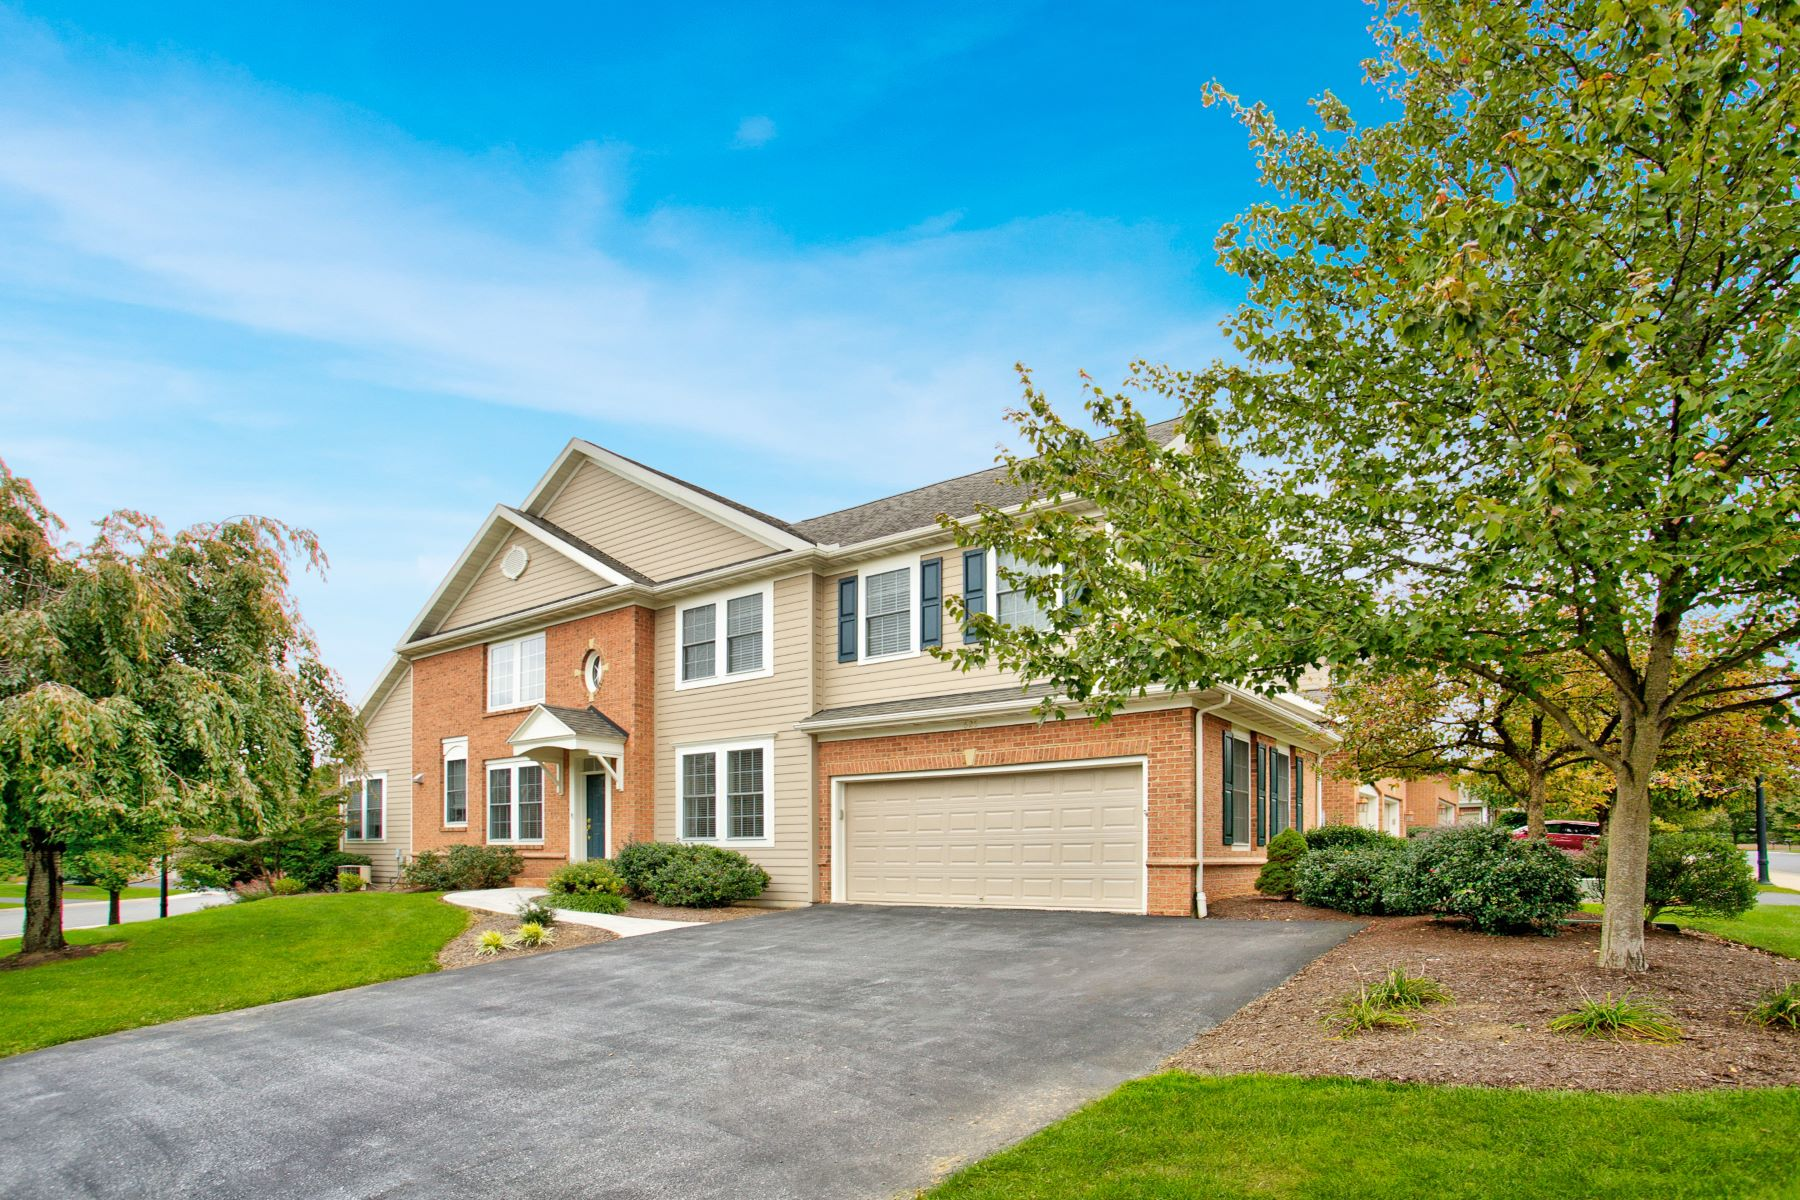 Single Family Home for Sale at 625 Northfield Road 625 Northfield Road Lititz, Pennsylvania 17543 United States